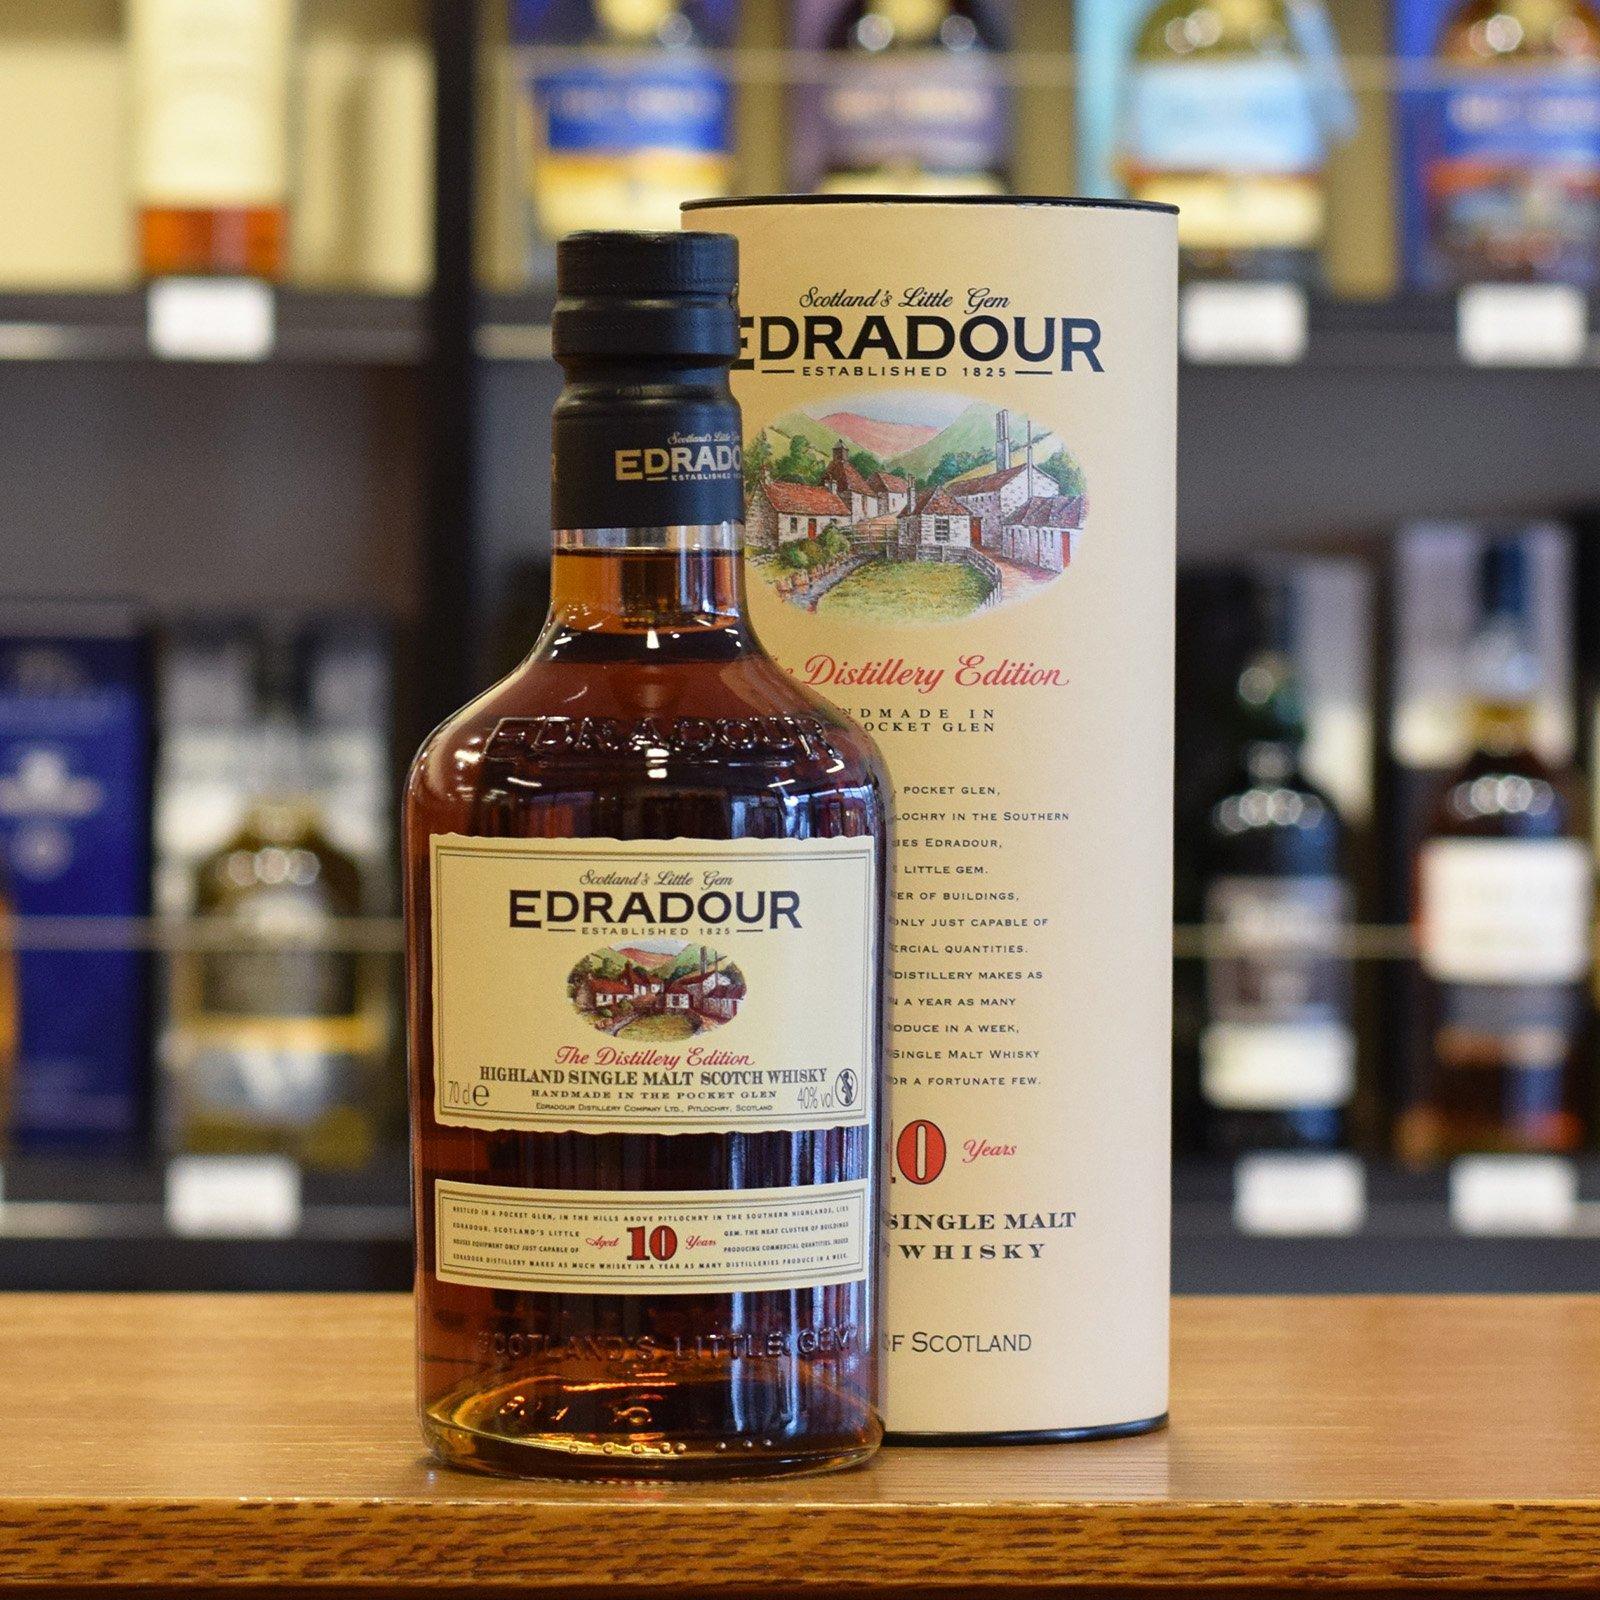 Edradour whisky 10 y.o.